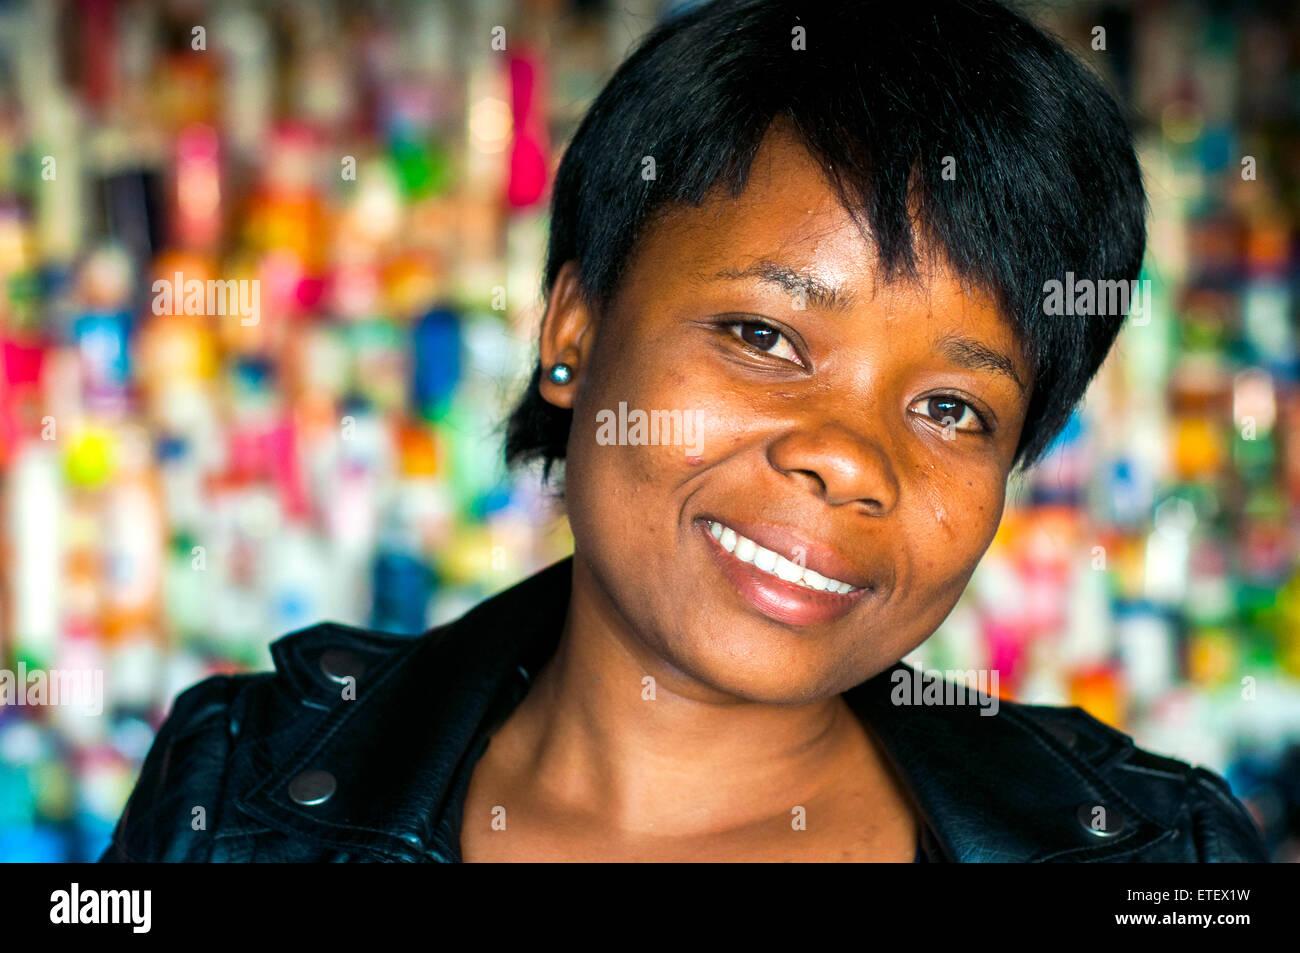 Middle-aged woman in cosmetics outlet, Nyamirambo, Kigali, Rwanda - Stock Image